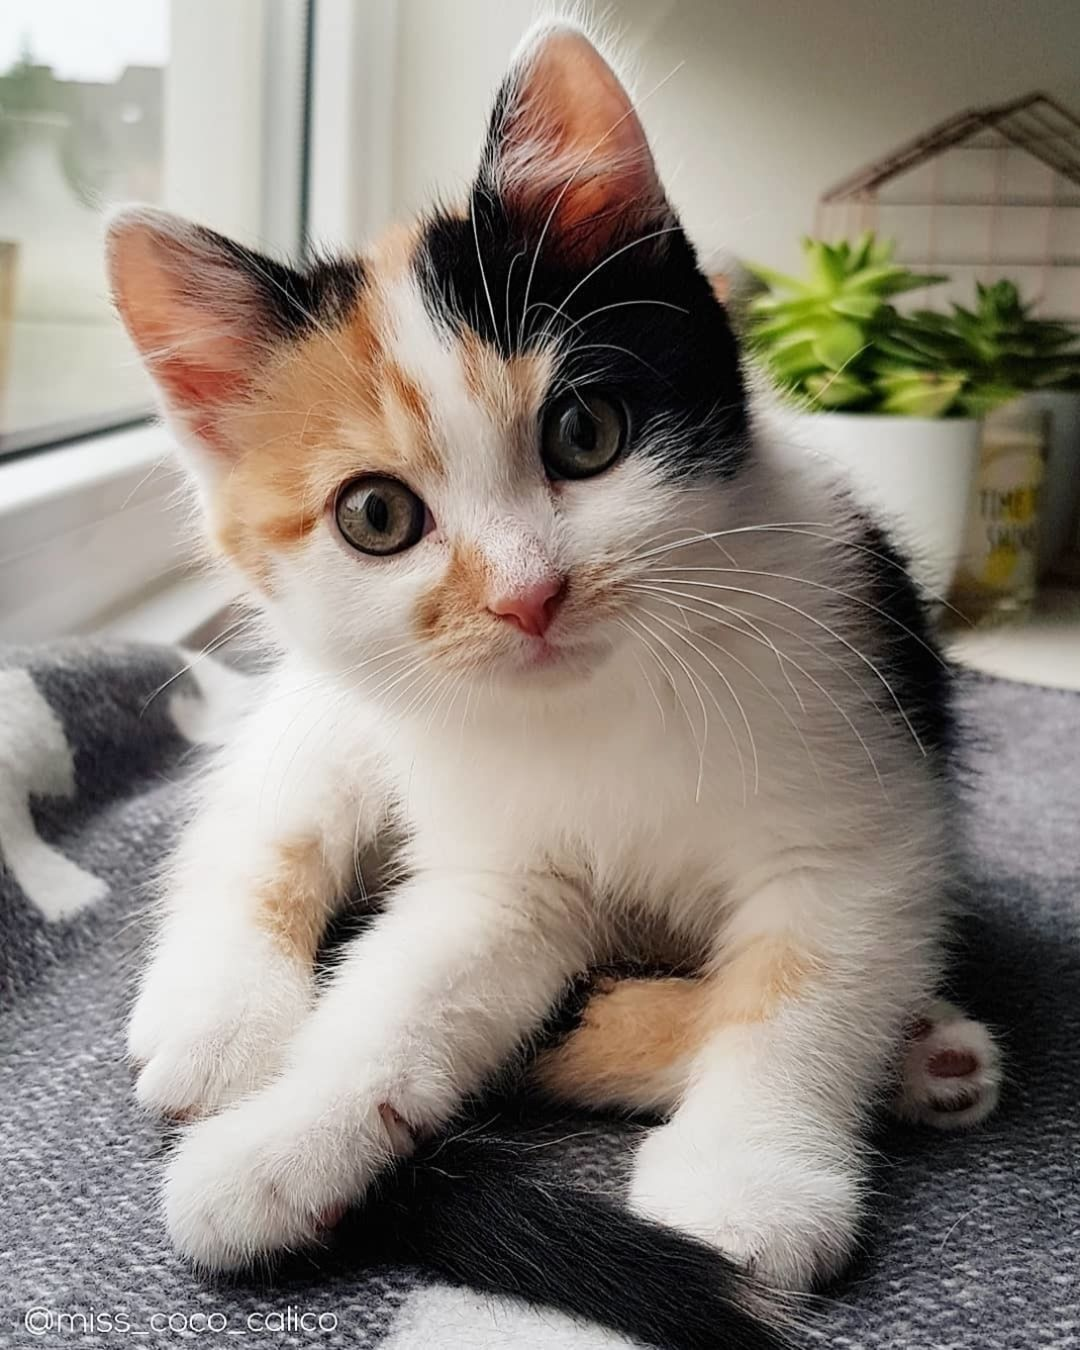 Cat Lover Inc On Instagram So Cute Its A Beautiful Shot Double Tap Follow Me Catloverinc Cute Kittens Sopoja Elaimia Kitties